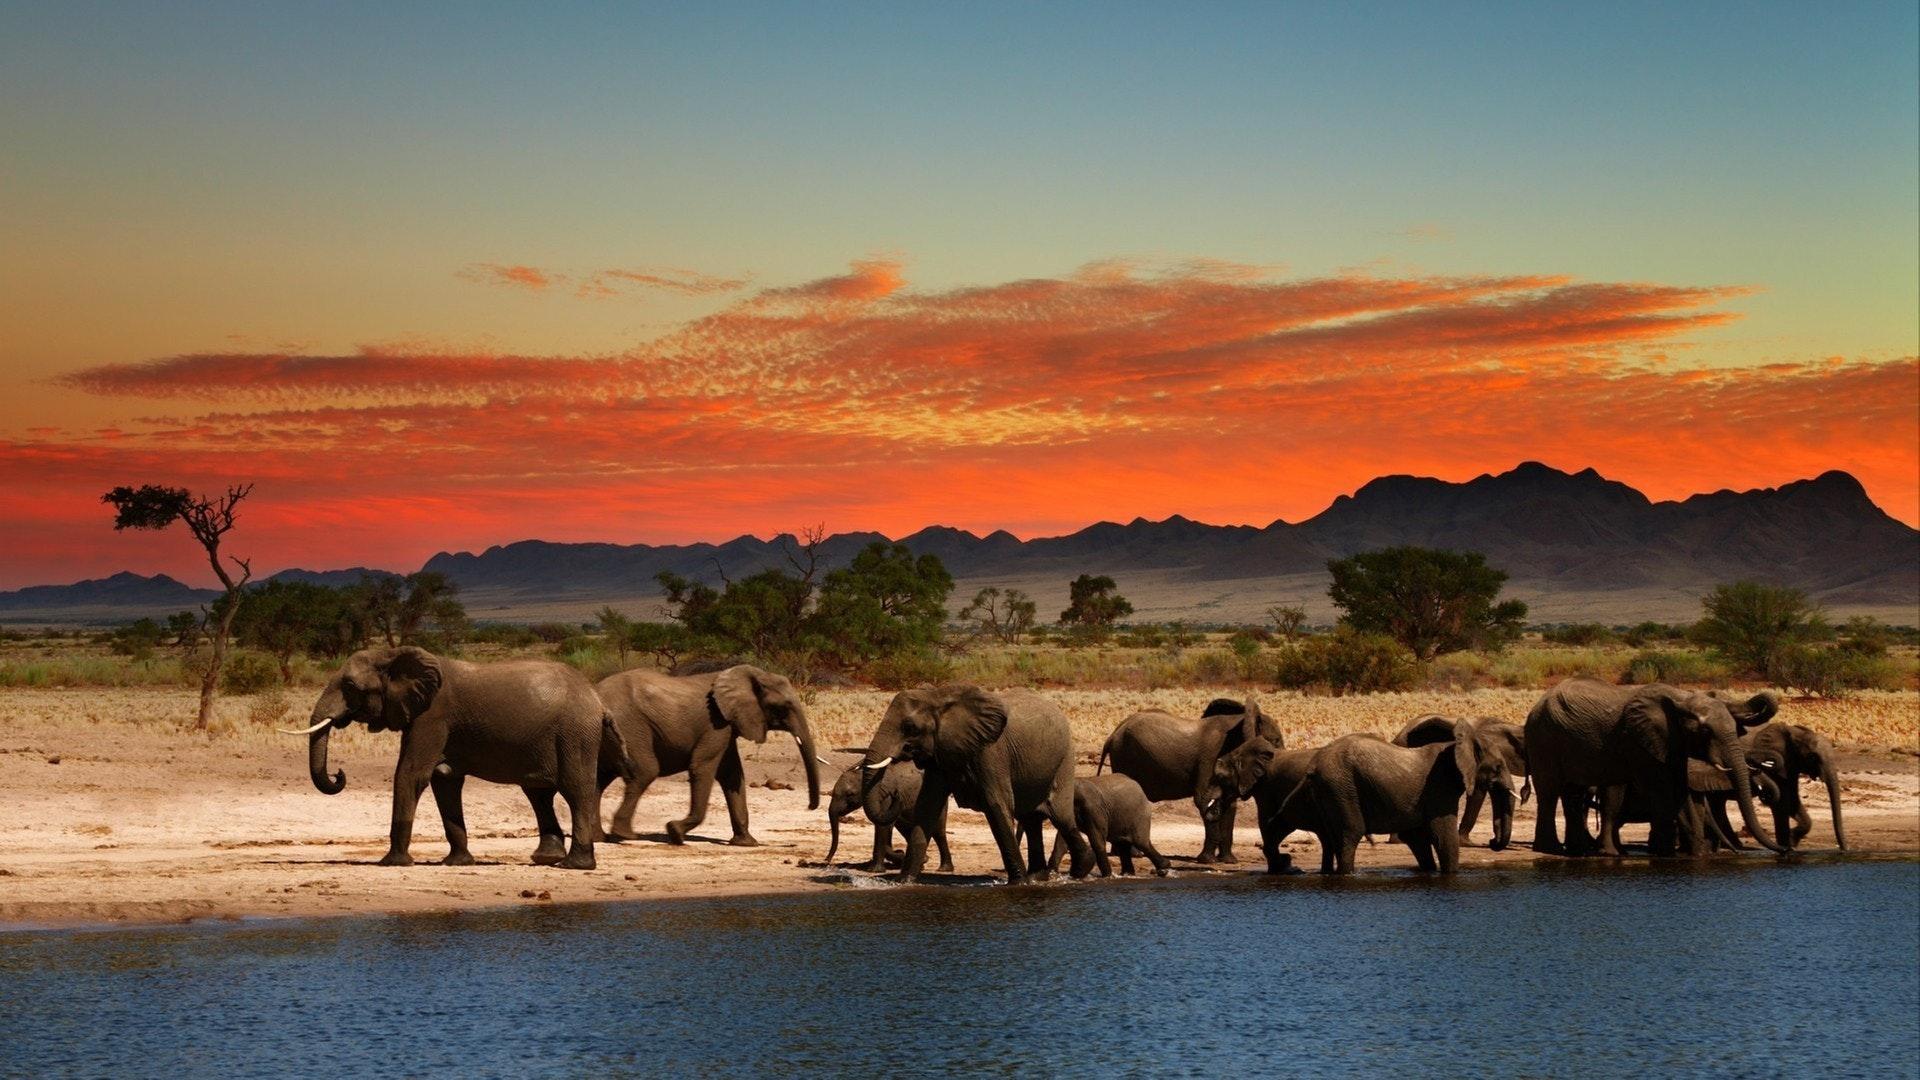 Herd of elephants in African savanna at sunset